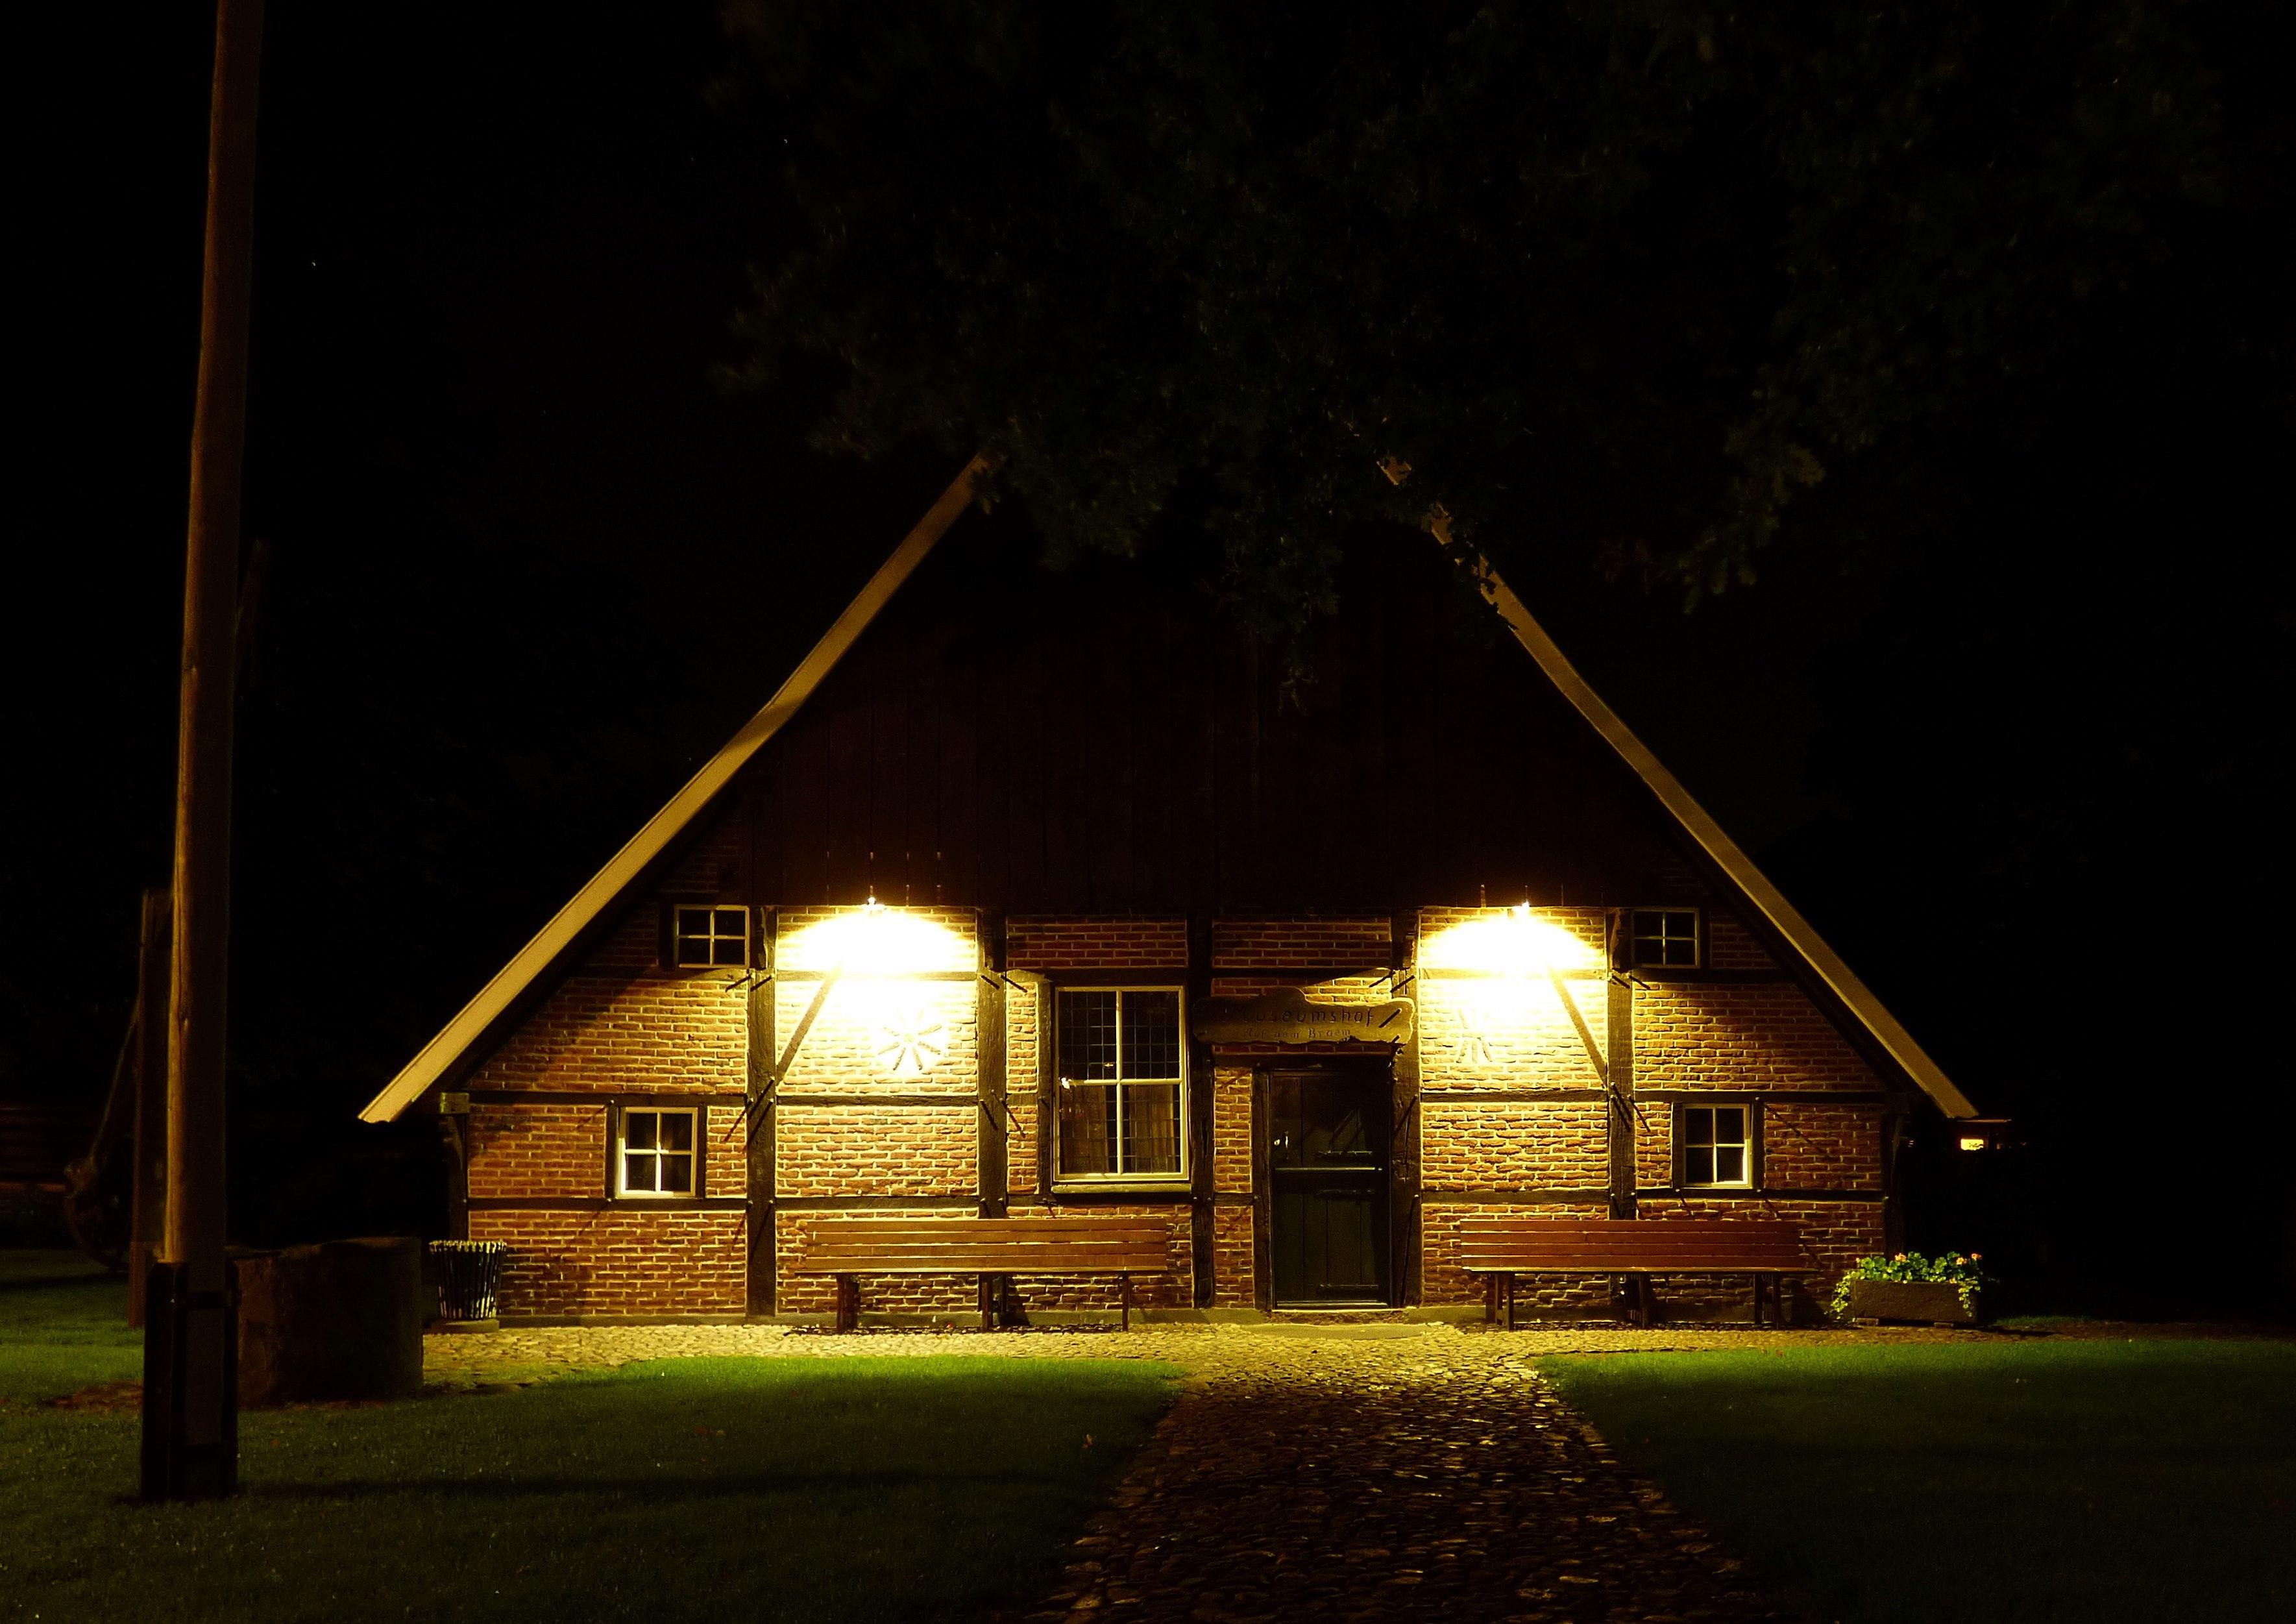 домики ночью картинки надо